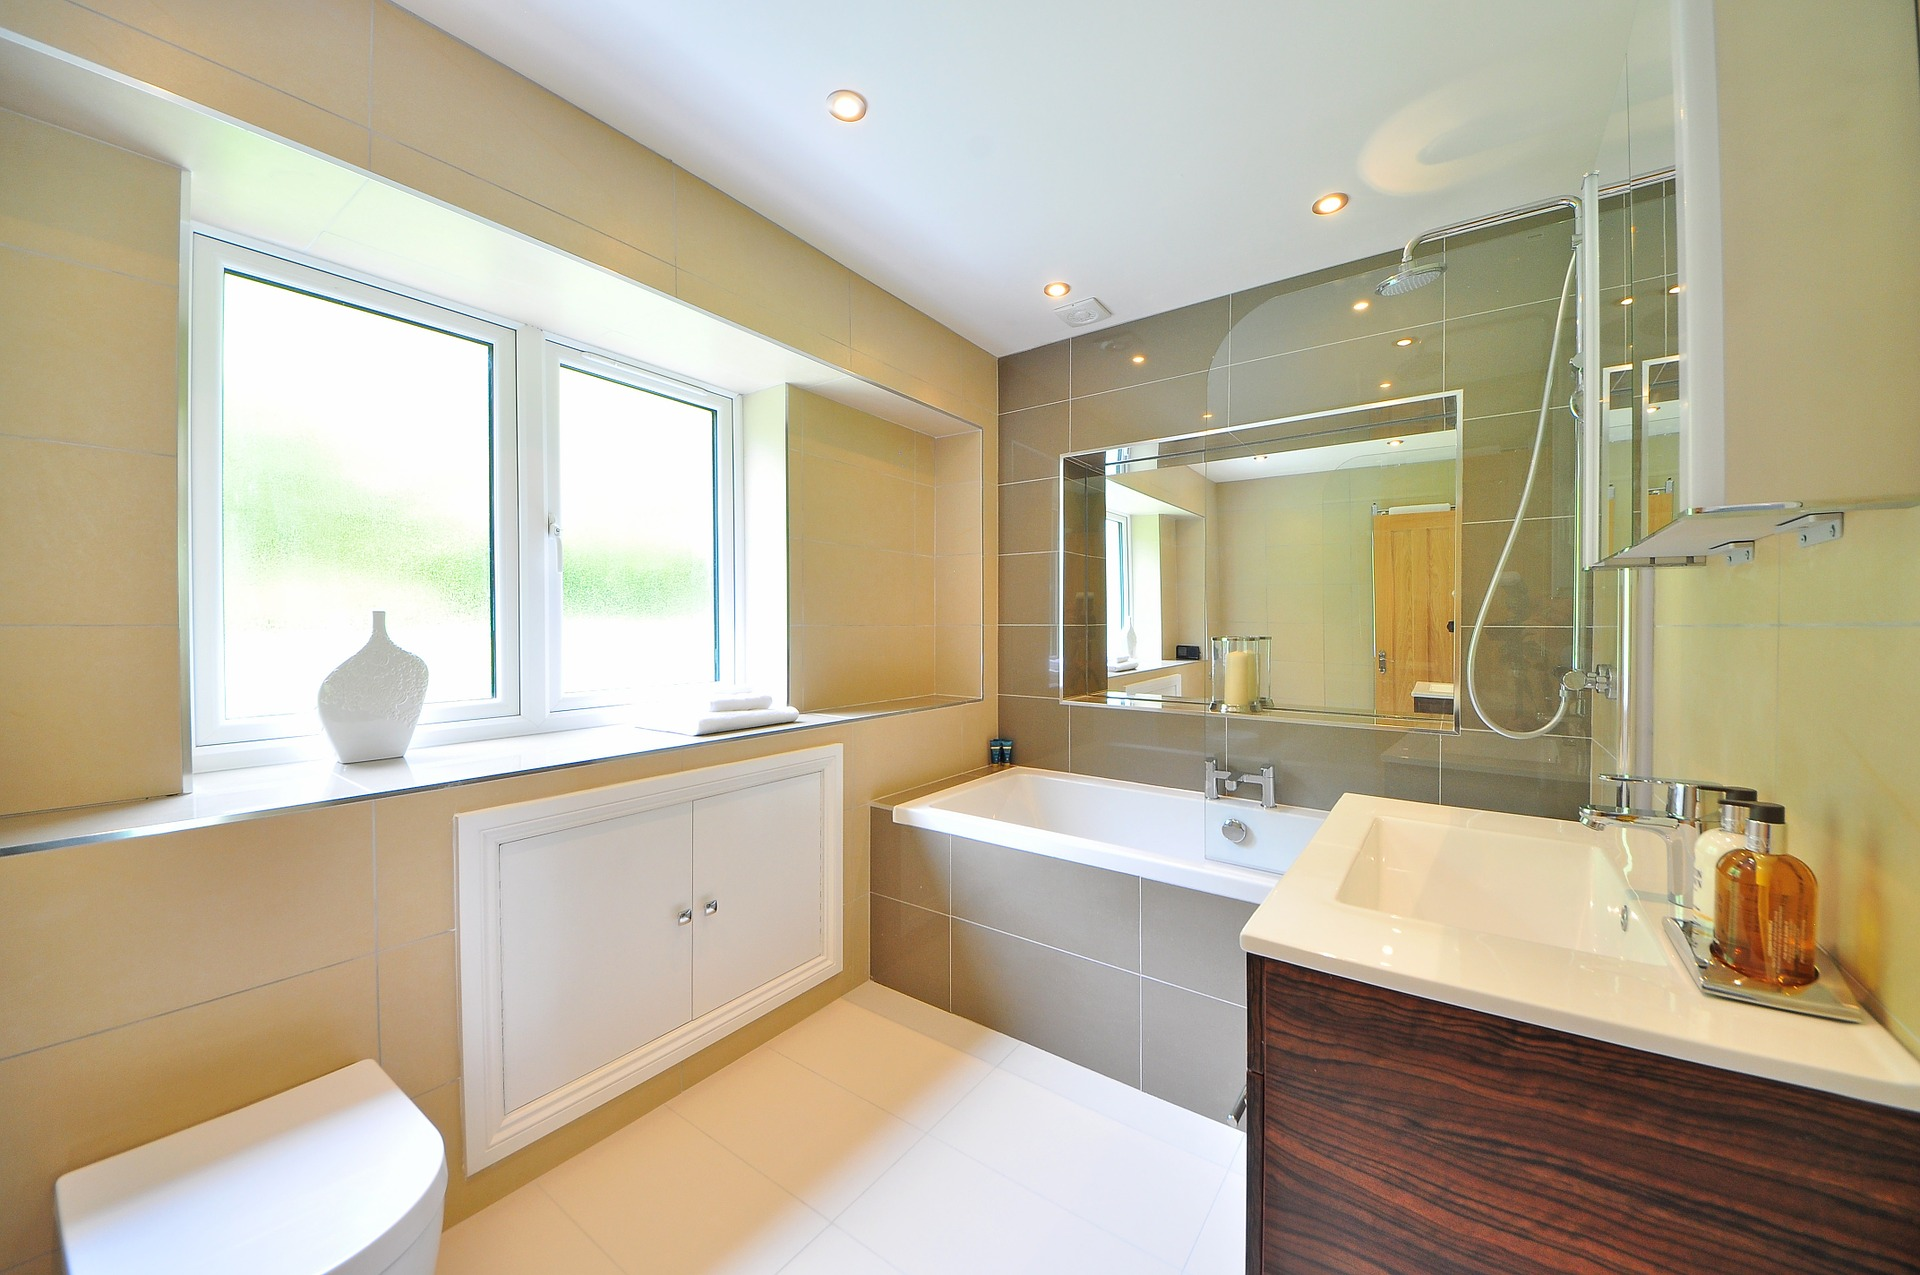 salle-de-bain-bien-aménagée